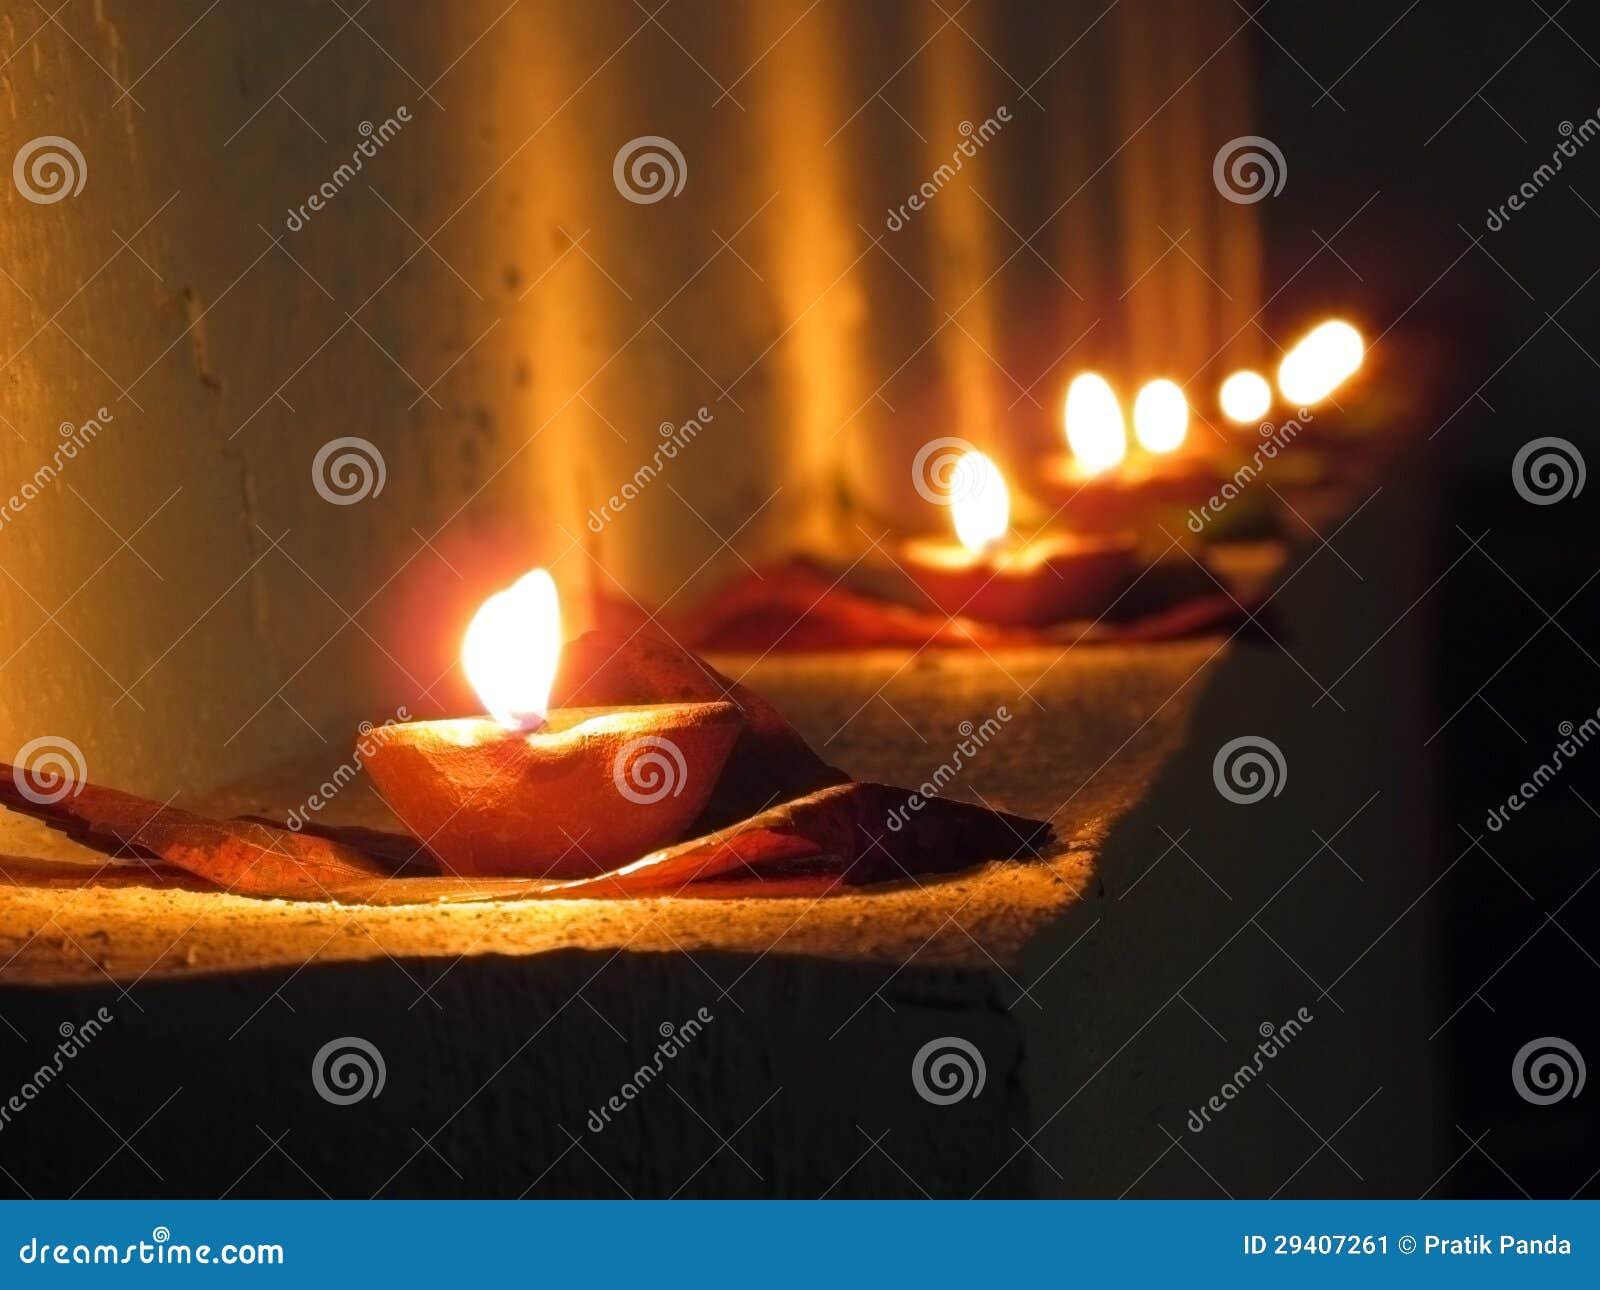 Diya, olielampen, Diwali en Indisch festival van lichten